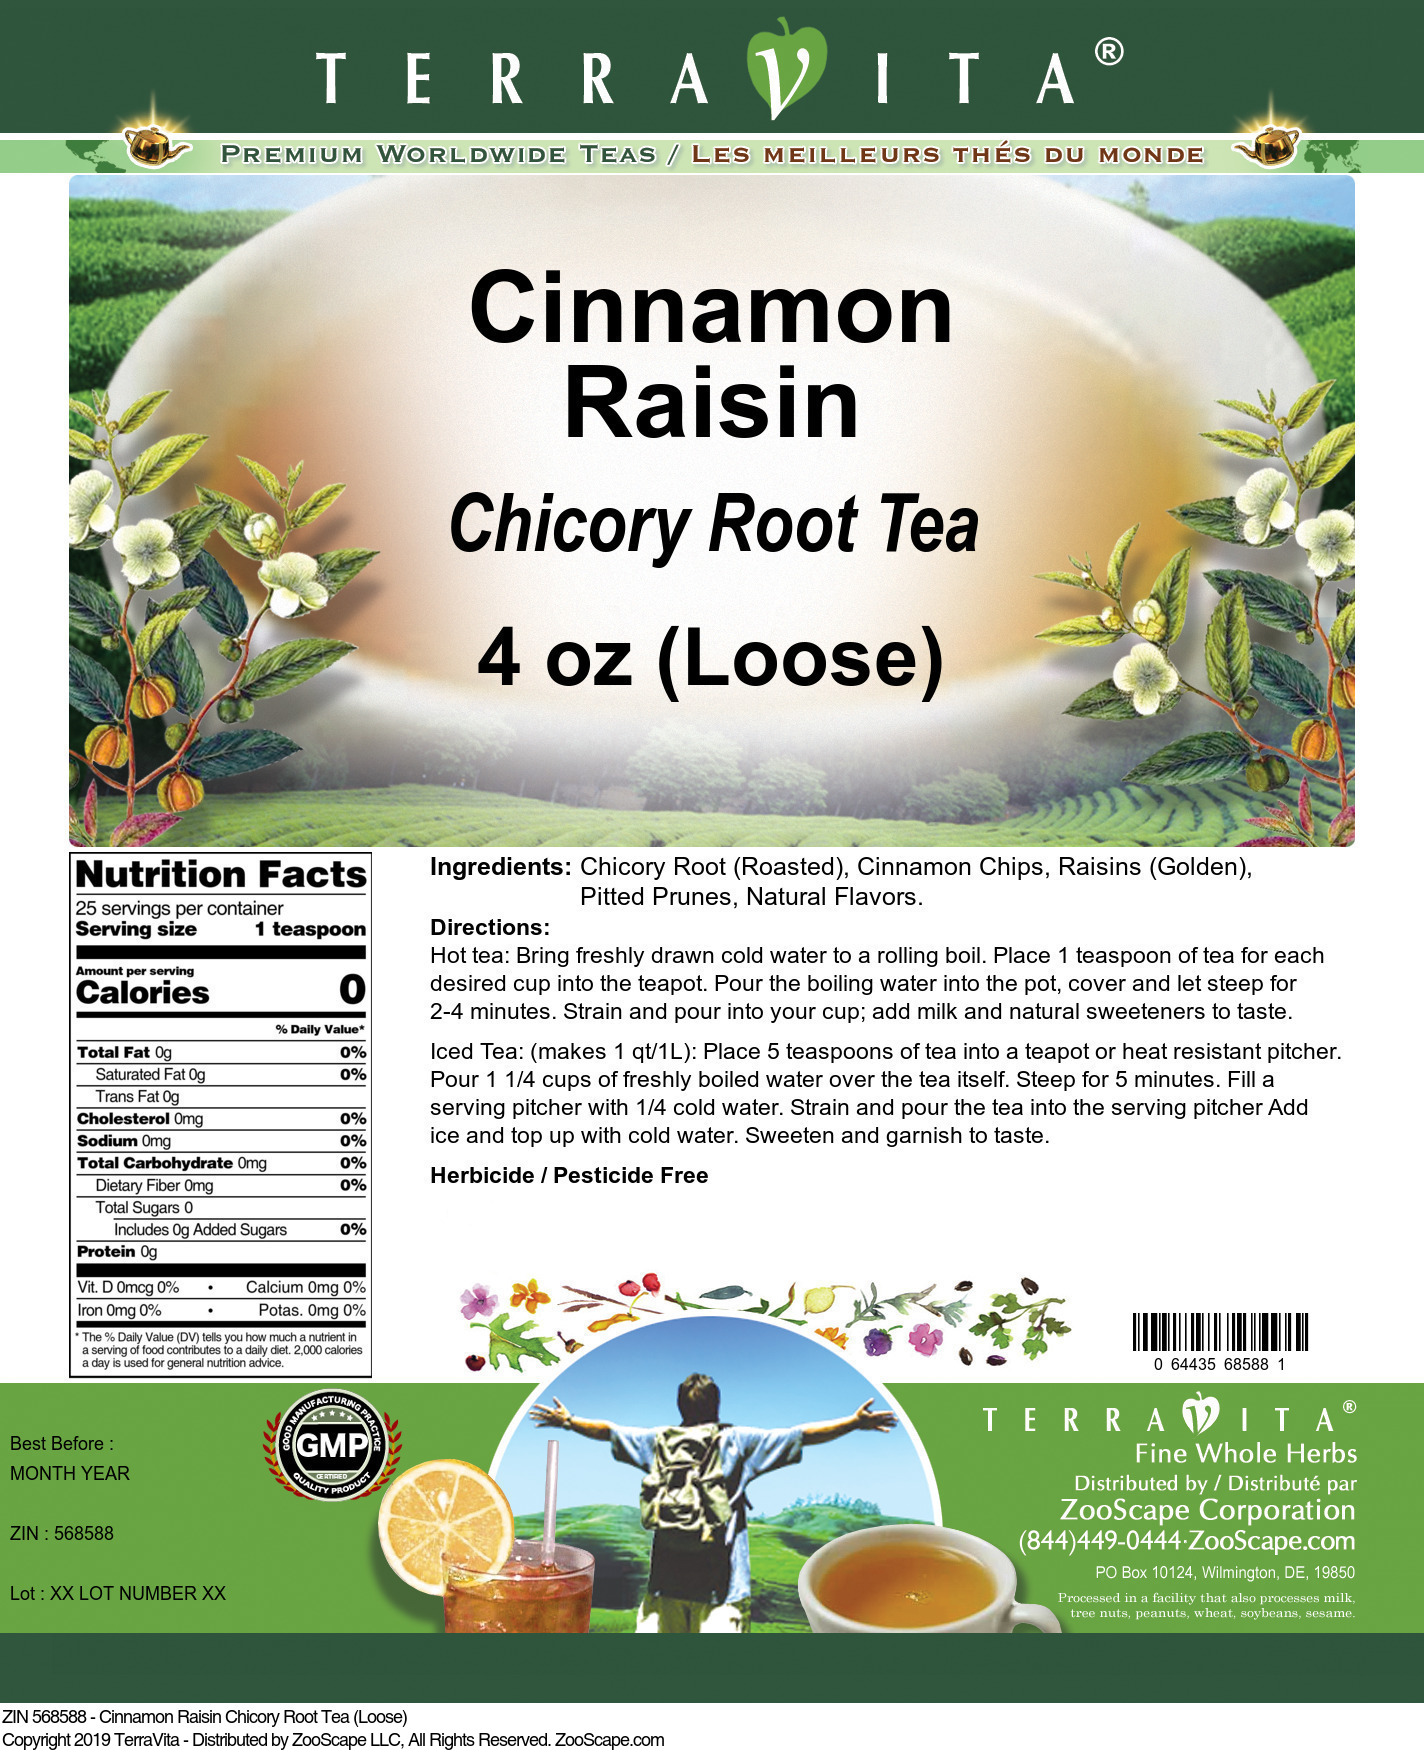 Cinnamon Raisin Chicory Root Tea (Loose)